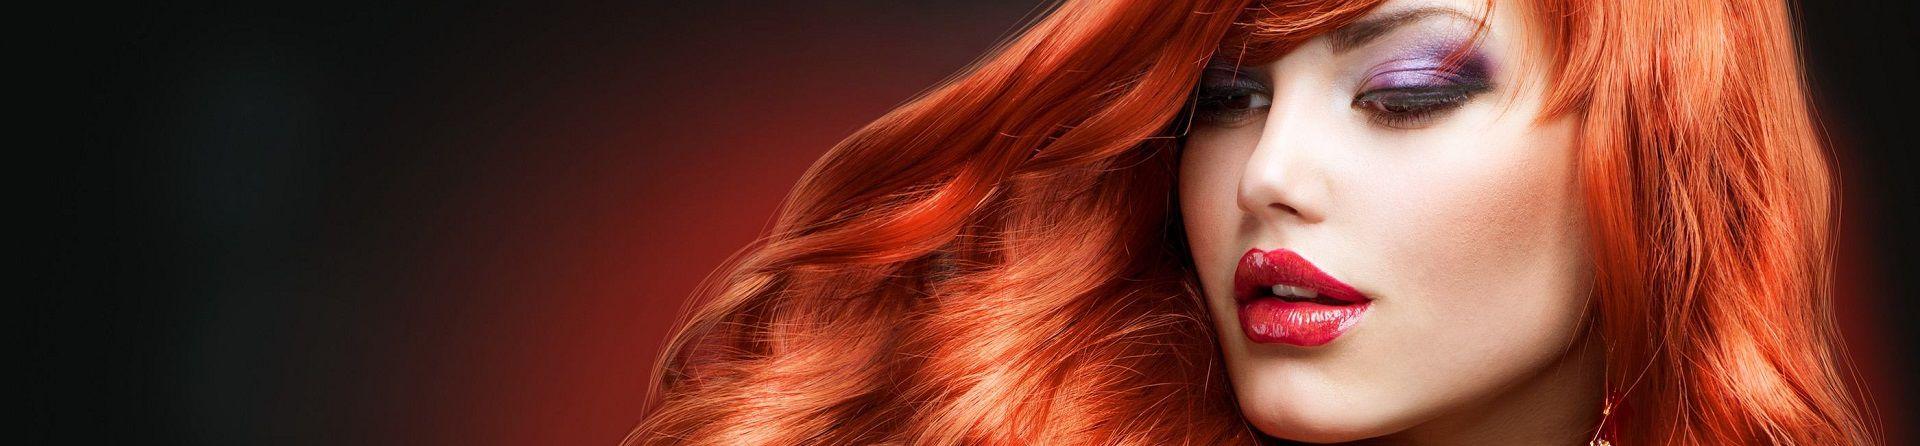 acheter extensions cheveux aliexpress